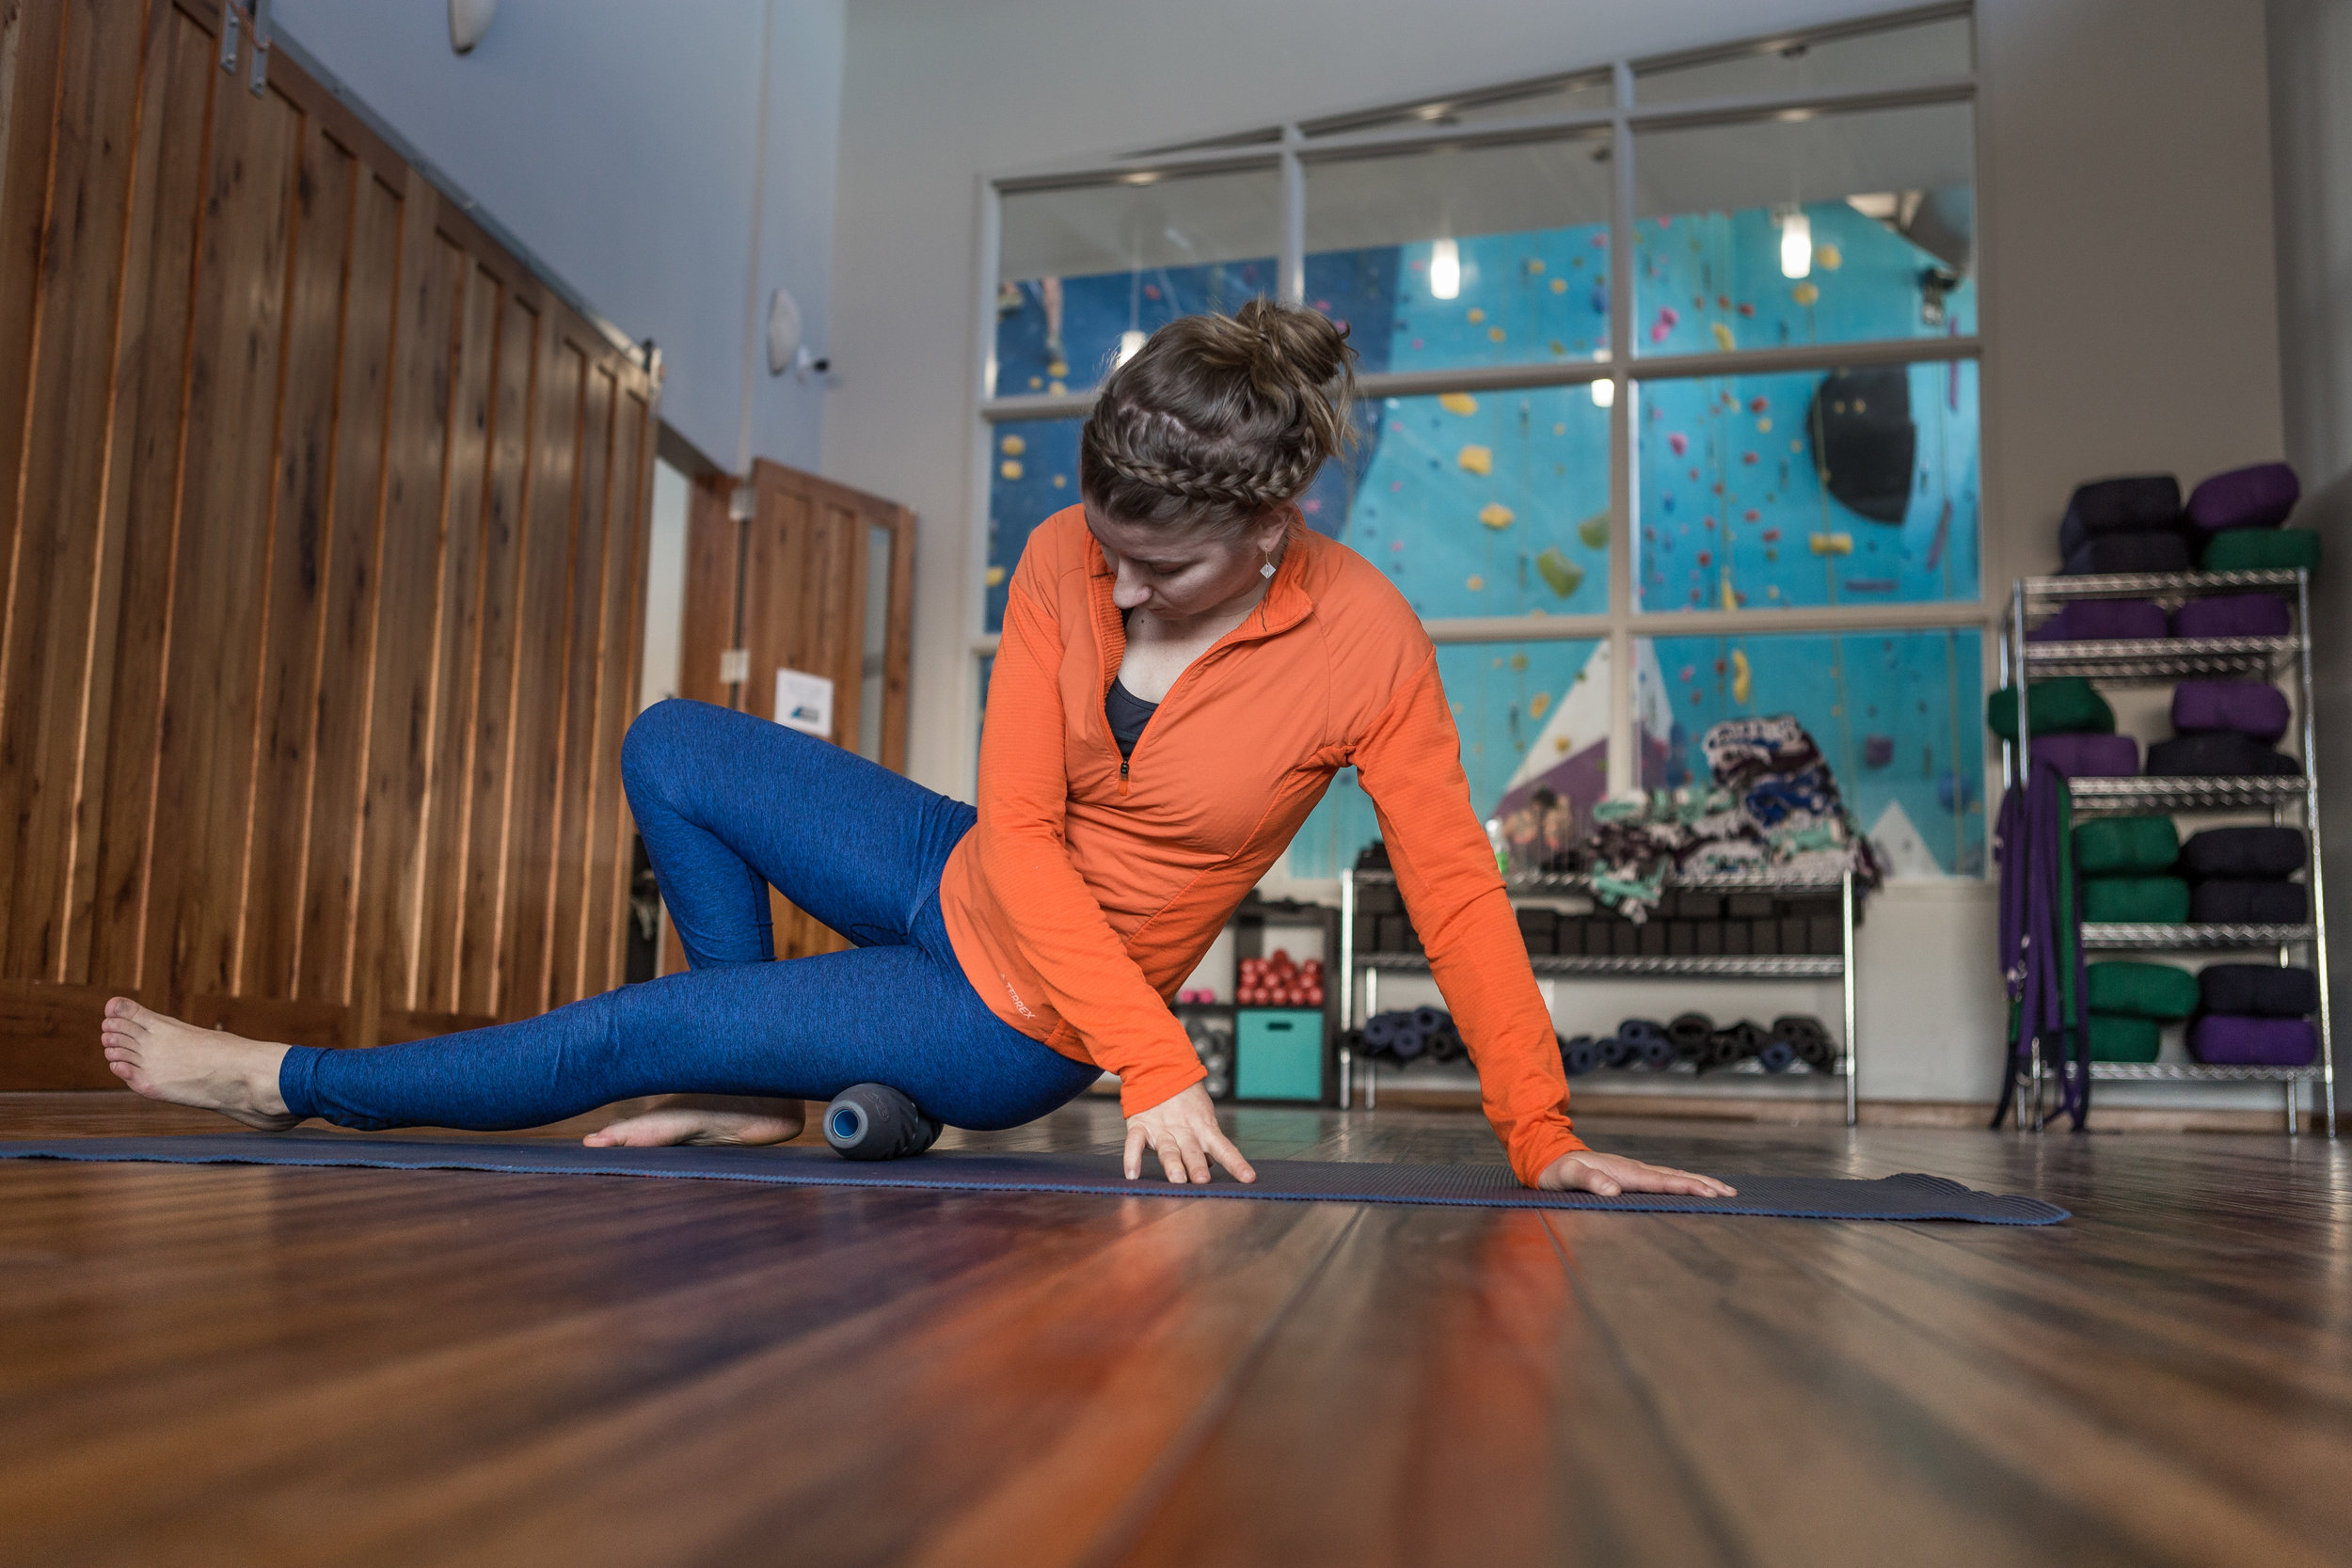 02.03.19 Kristina Yoga Ascent Studio-68.jpg